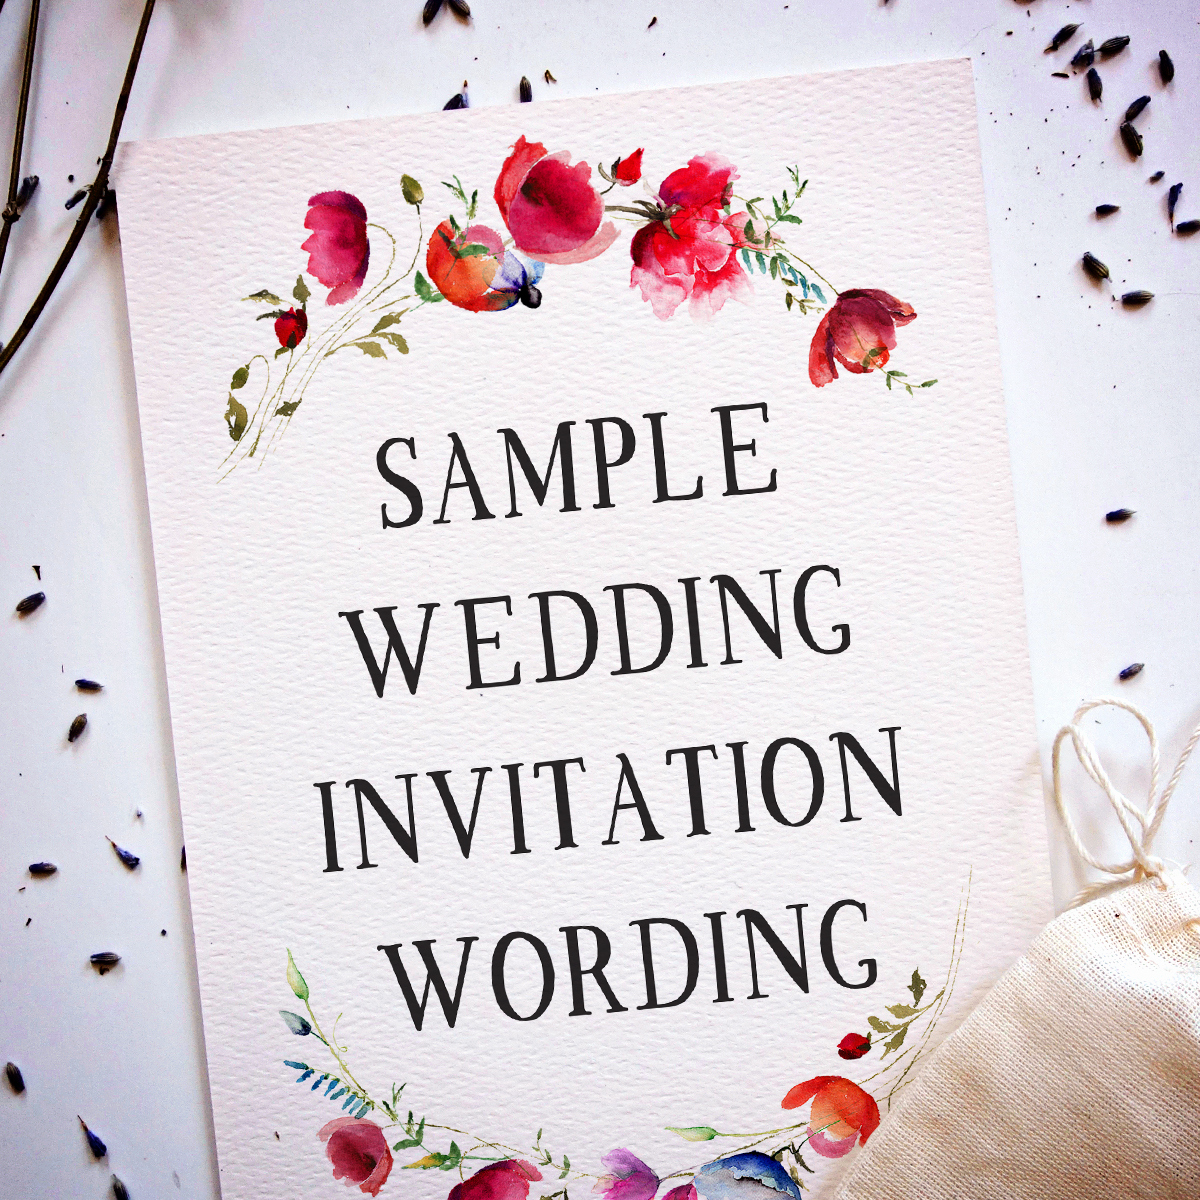 Creative Wedding Invitation Wording Lovely Wedding Invitation Wording Creative and Traditional